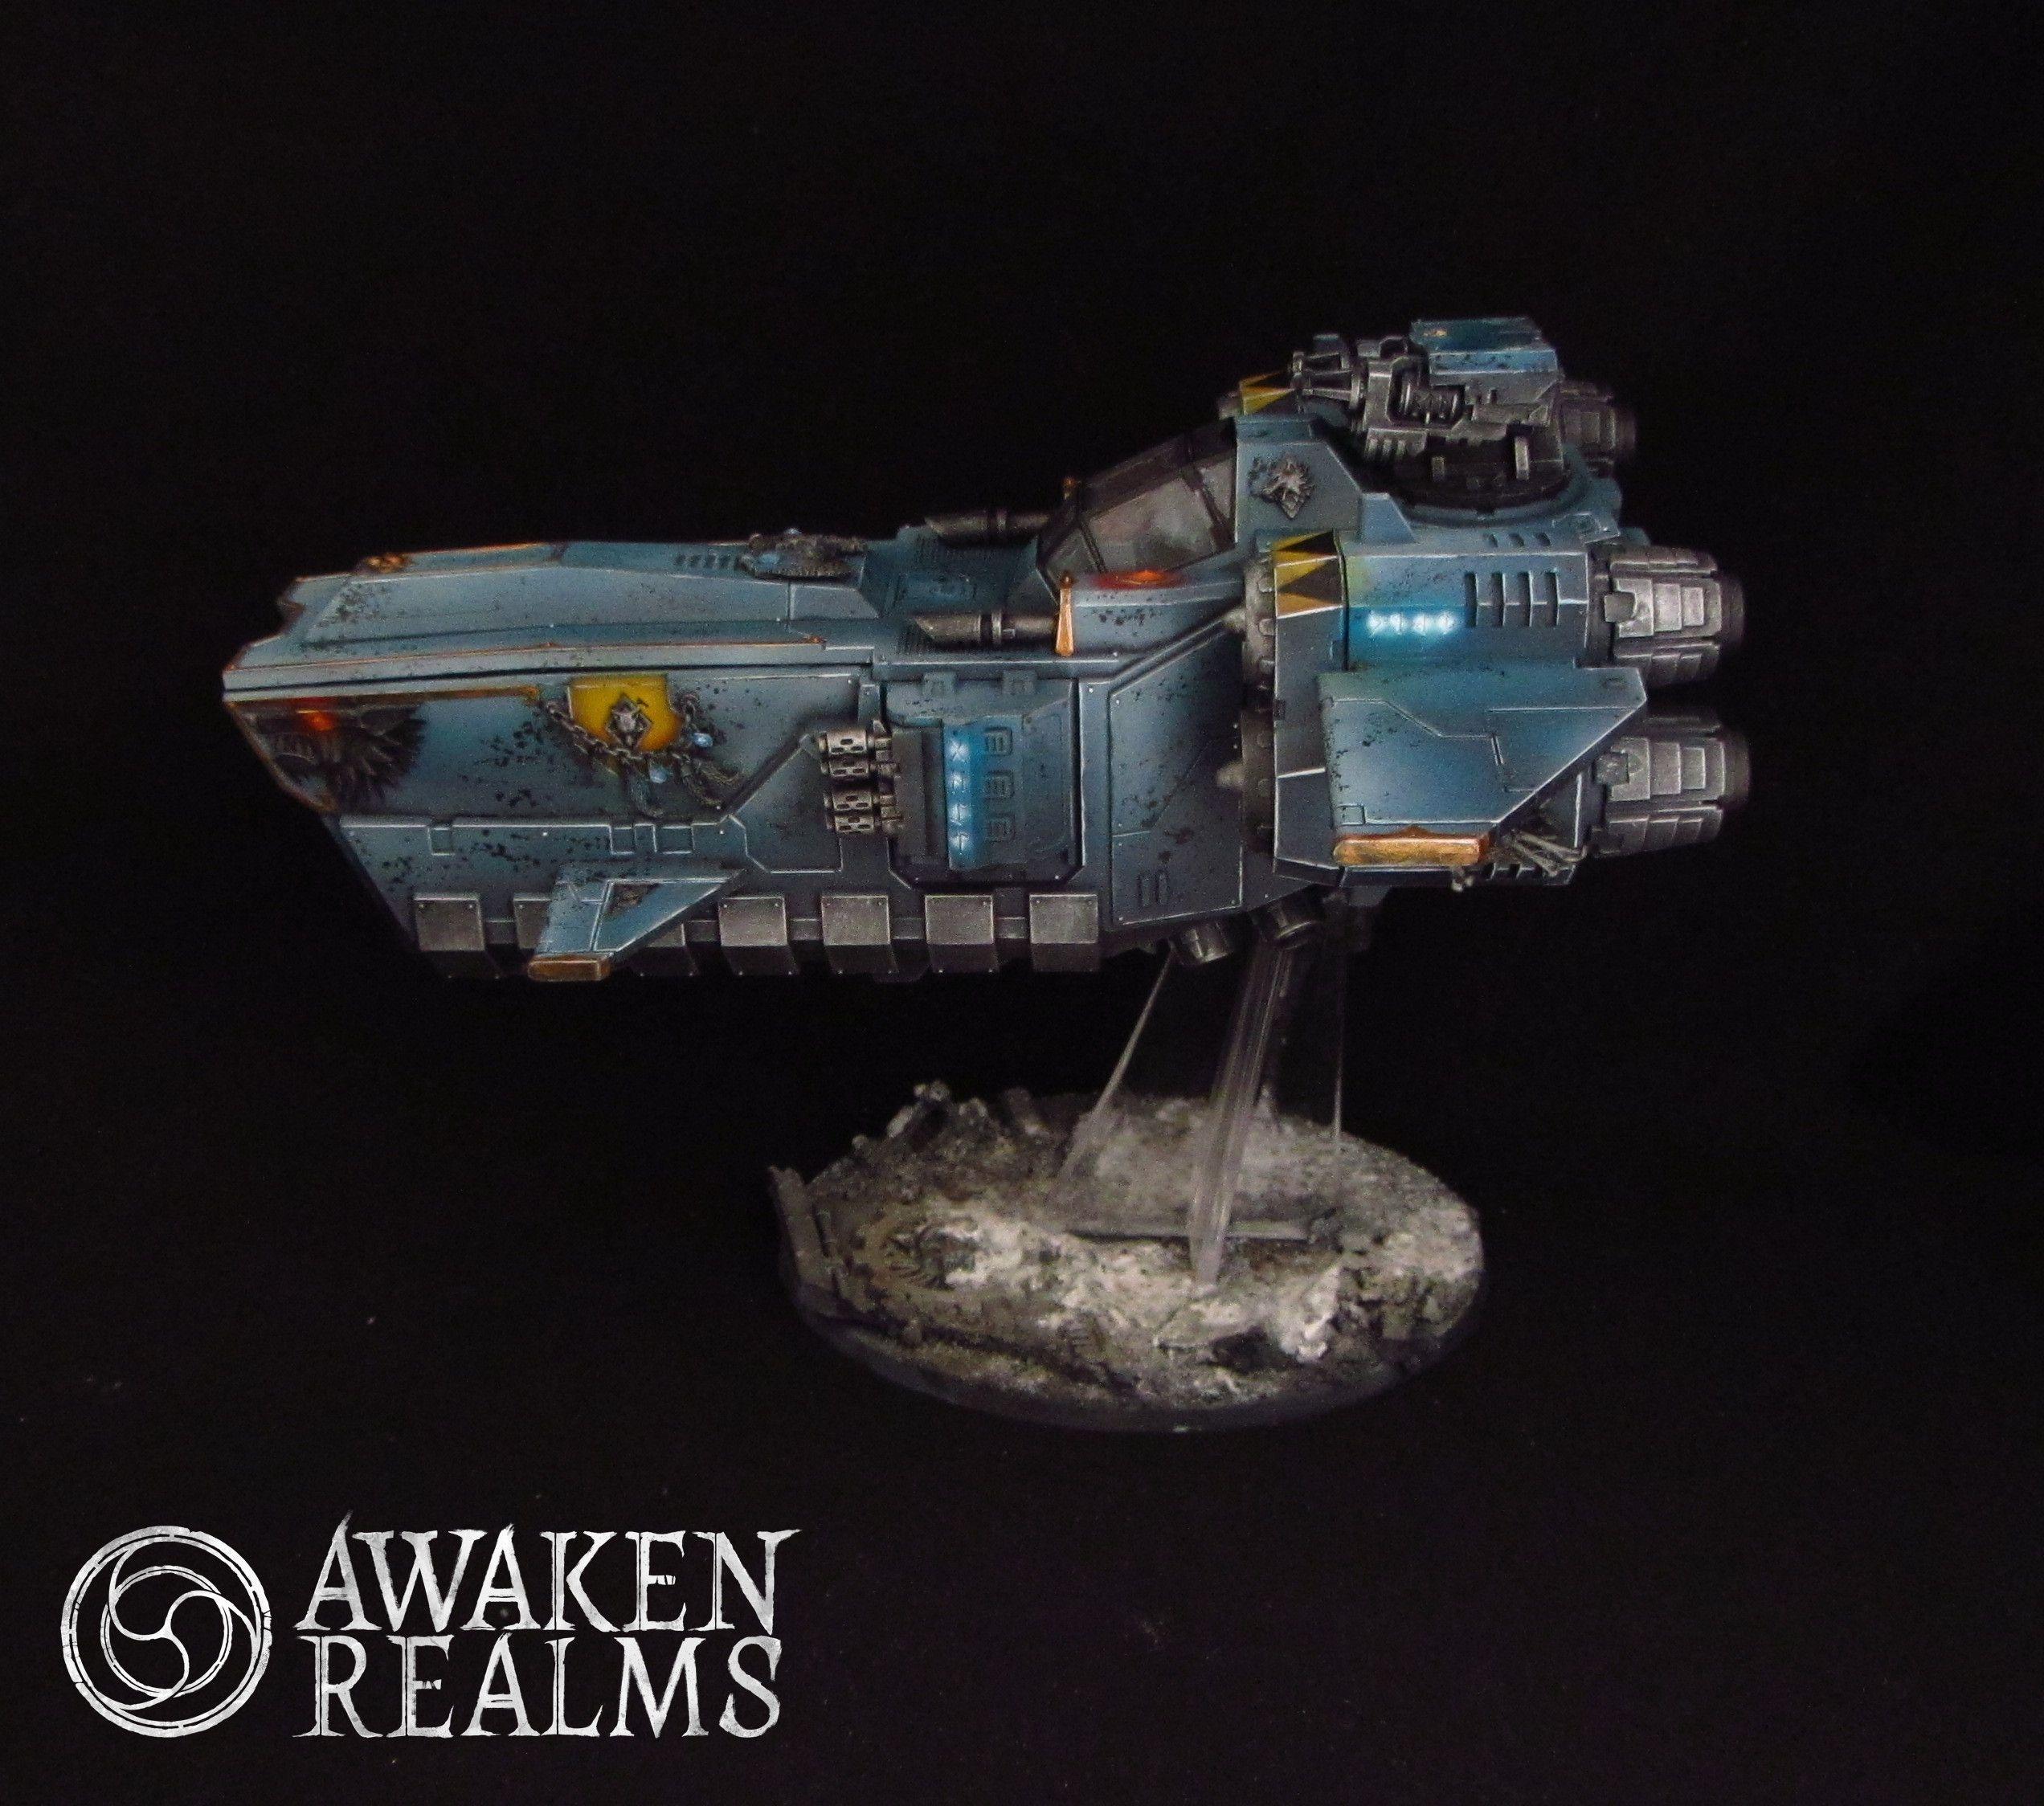 Stormwolve transporter